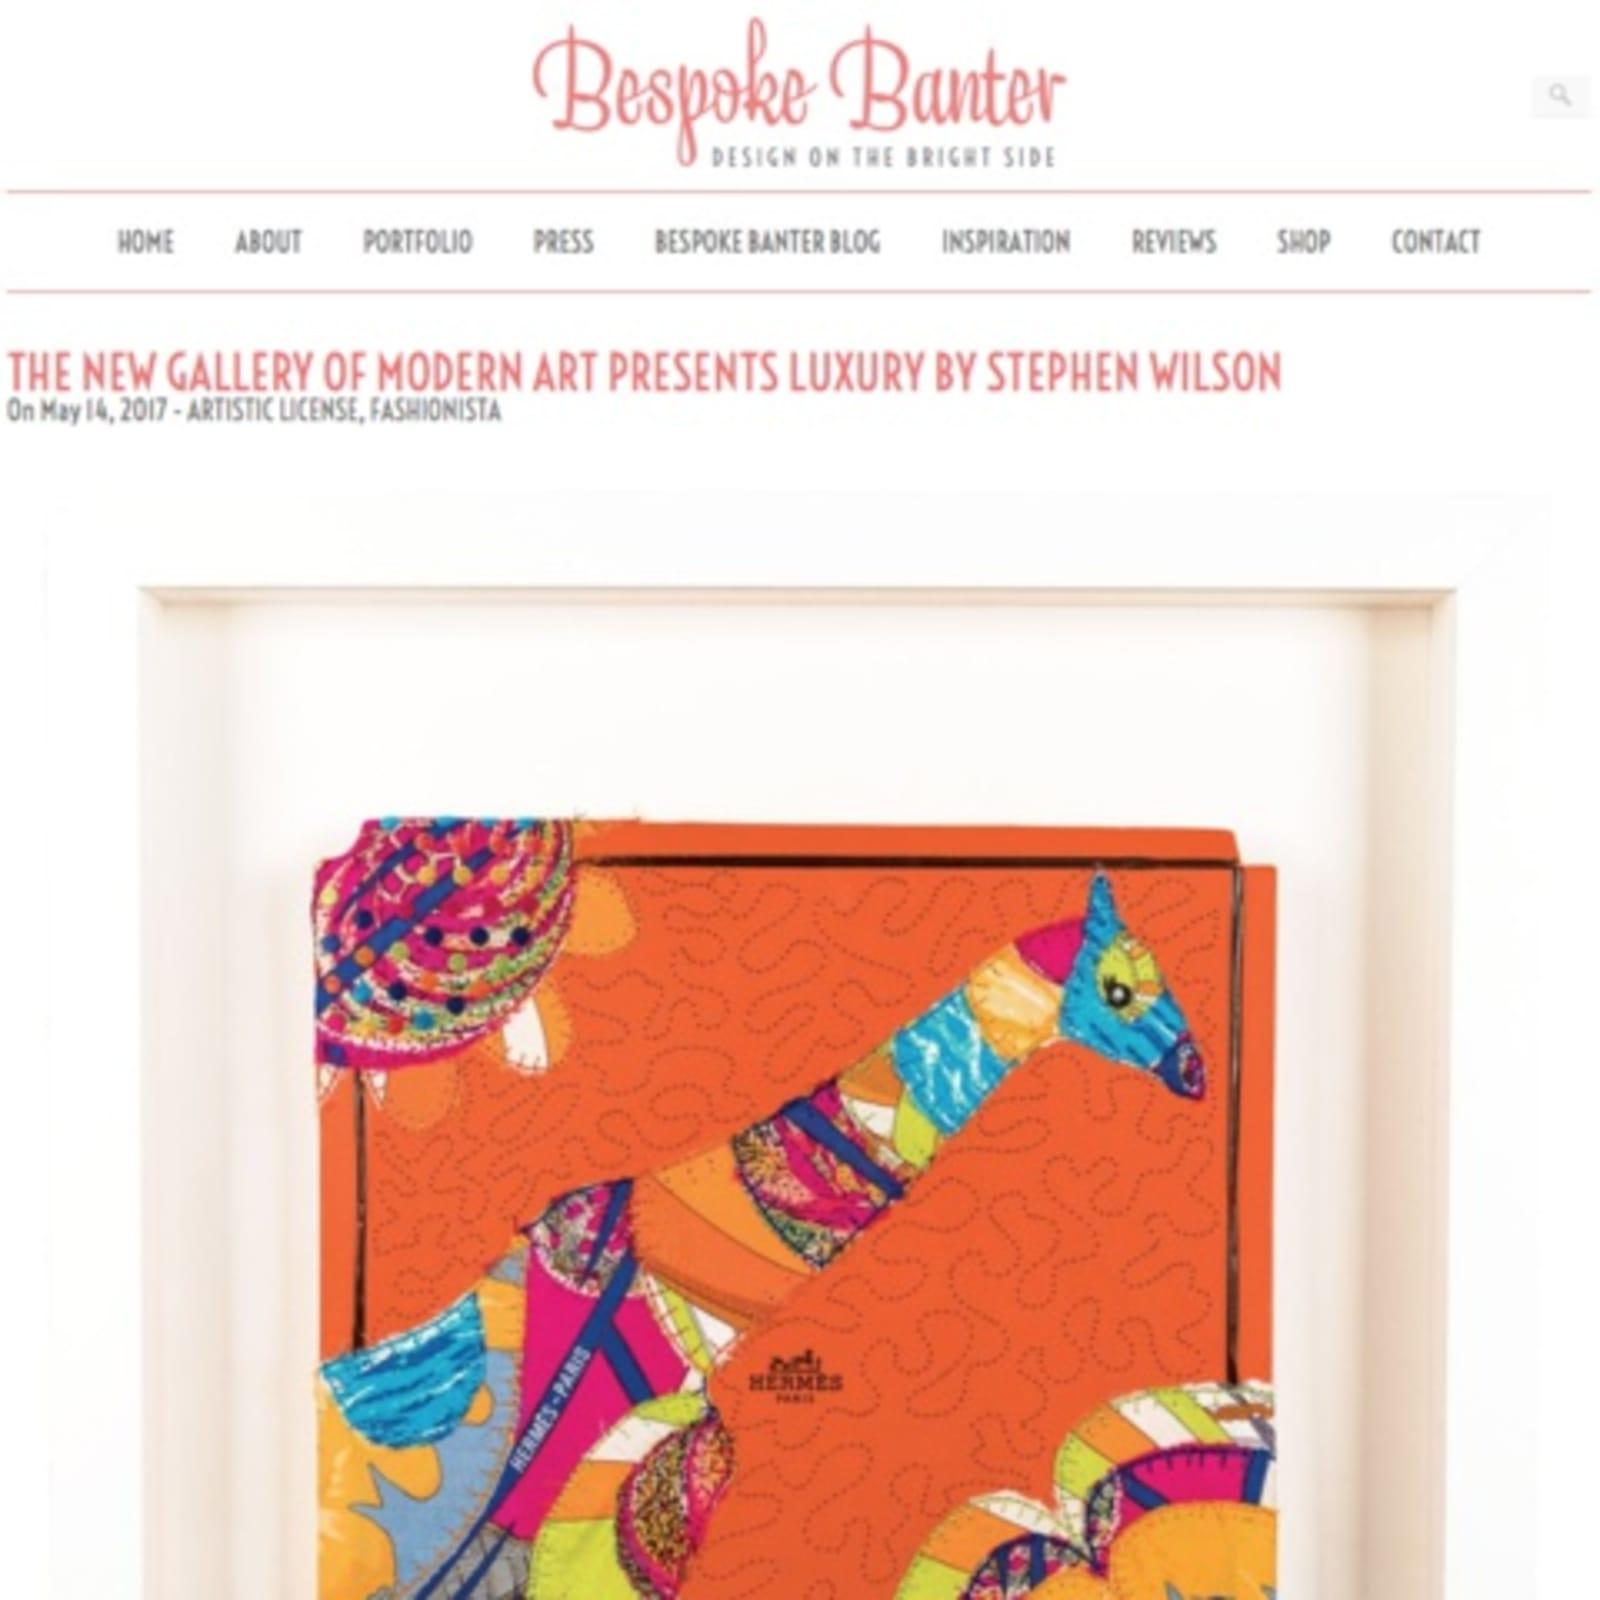 The New Gallery of Modern Art Presents Stephen Wilson Studio